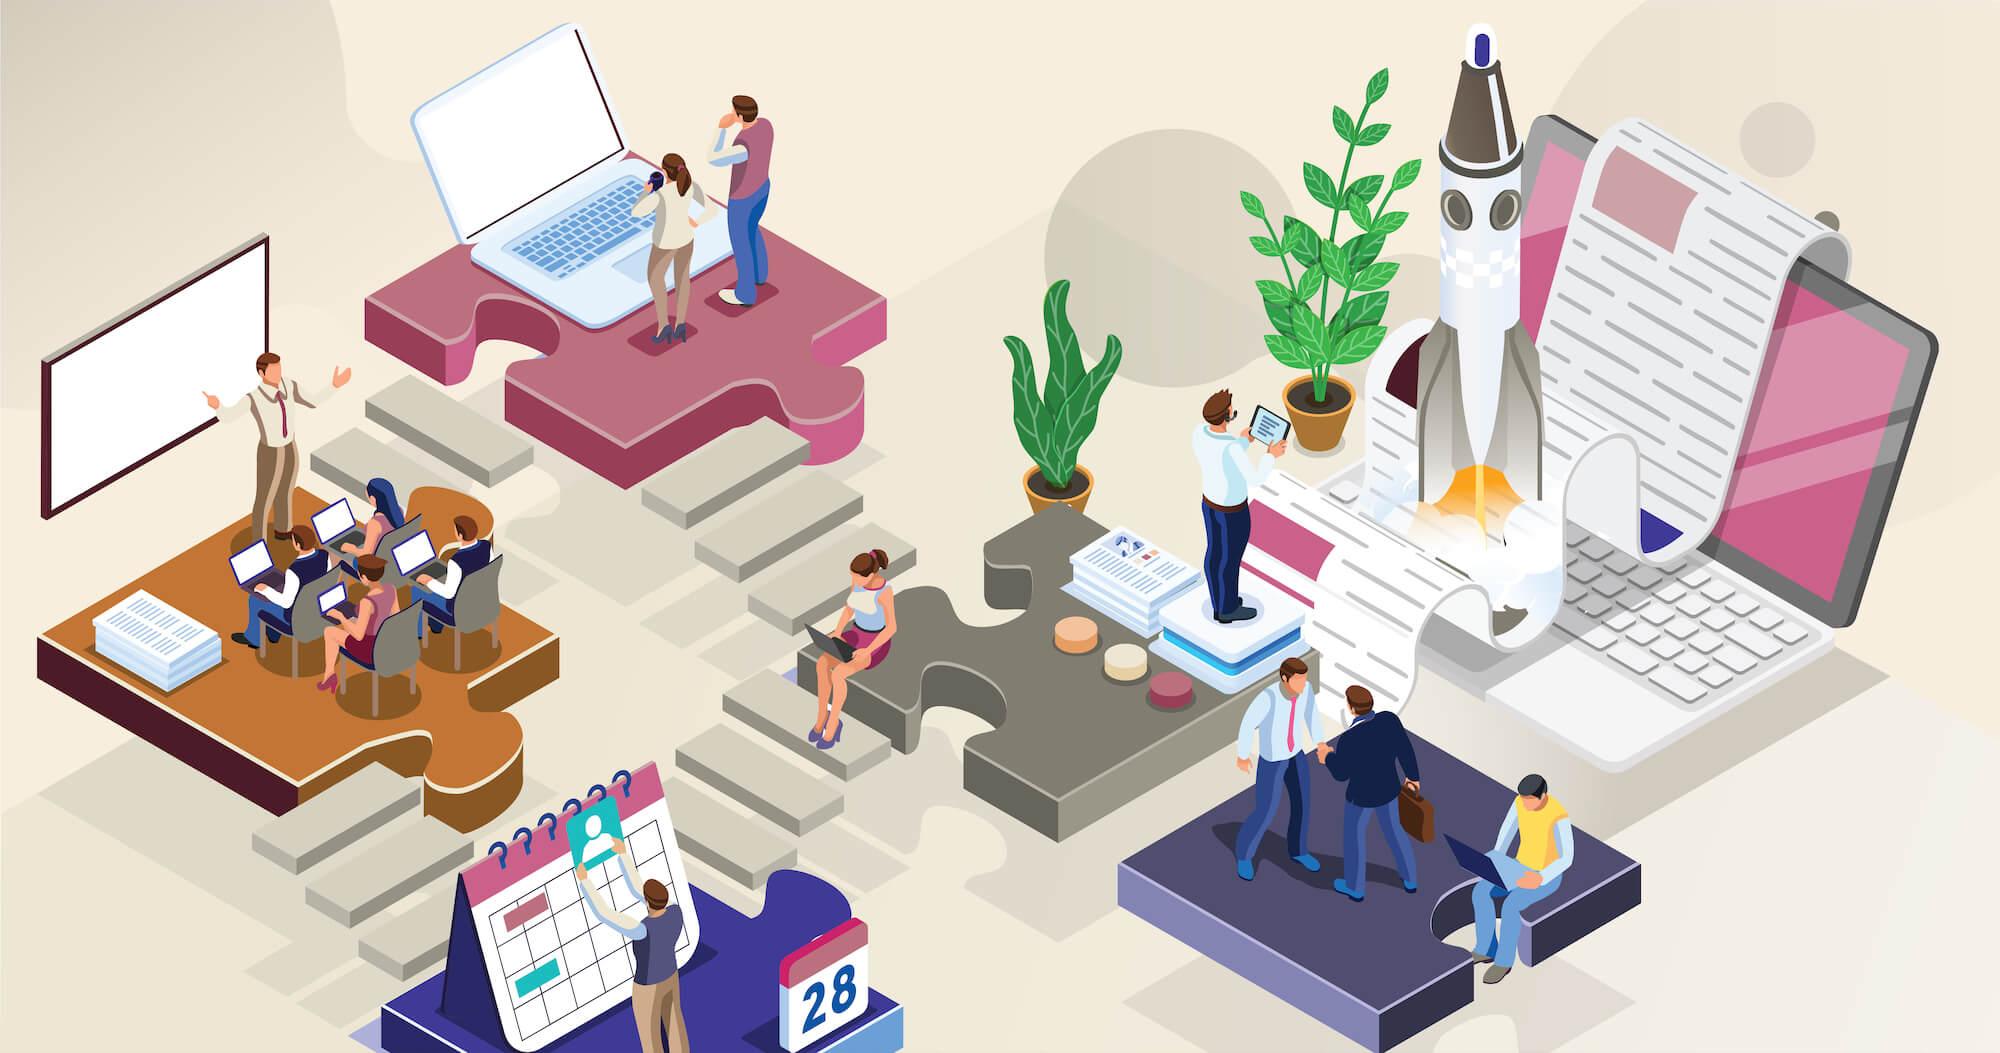 Innovation Culture เริ่มต้นสร้างวัฒนธรรมองค์กรเพื่อนวัตกรรม